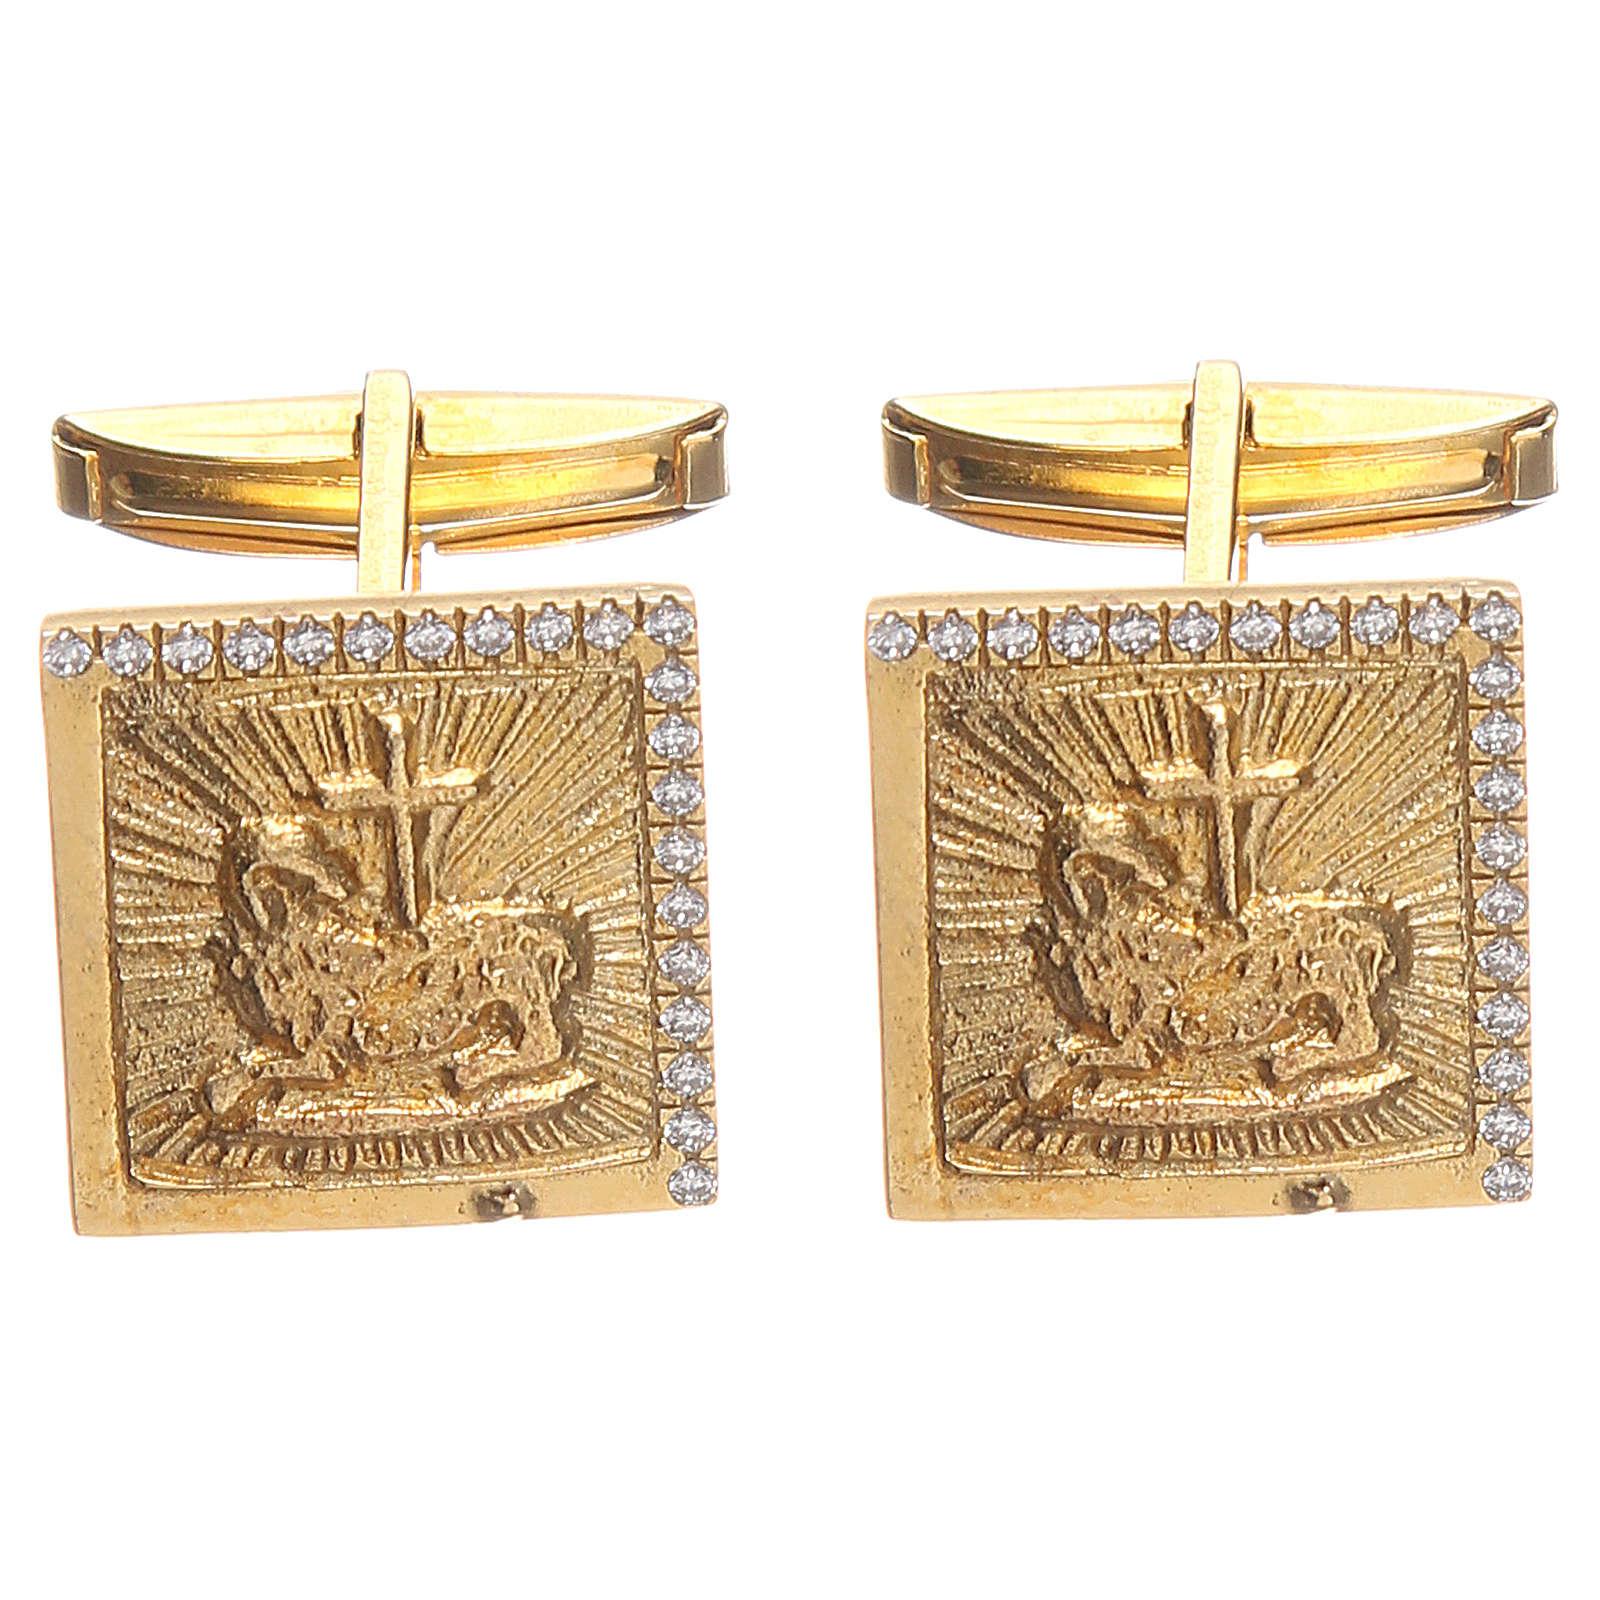 Gemelli per camicie argento 925 dorato Agnus Dei 1,7x1,7 cm 4